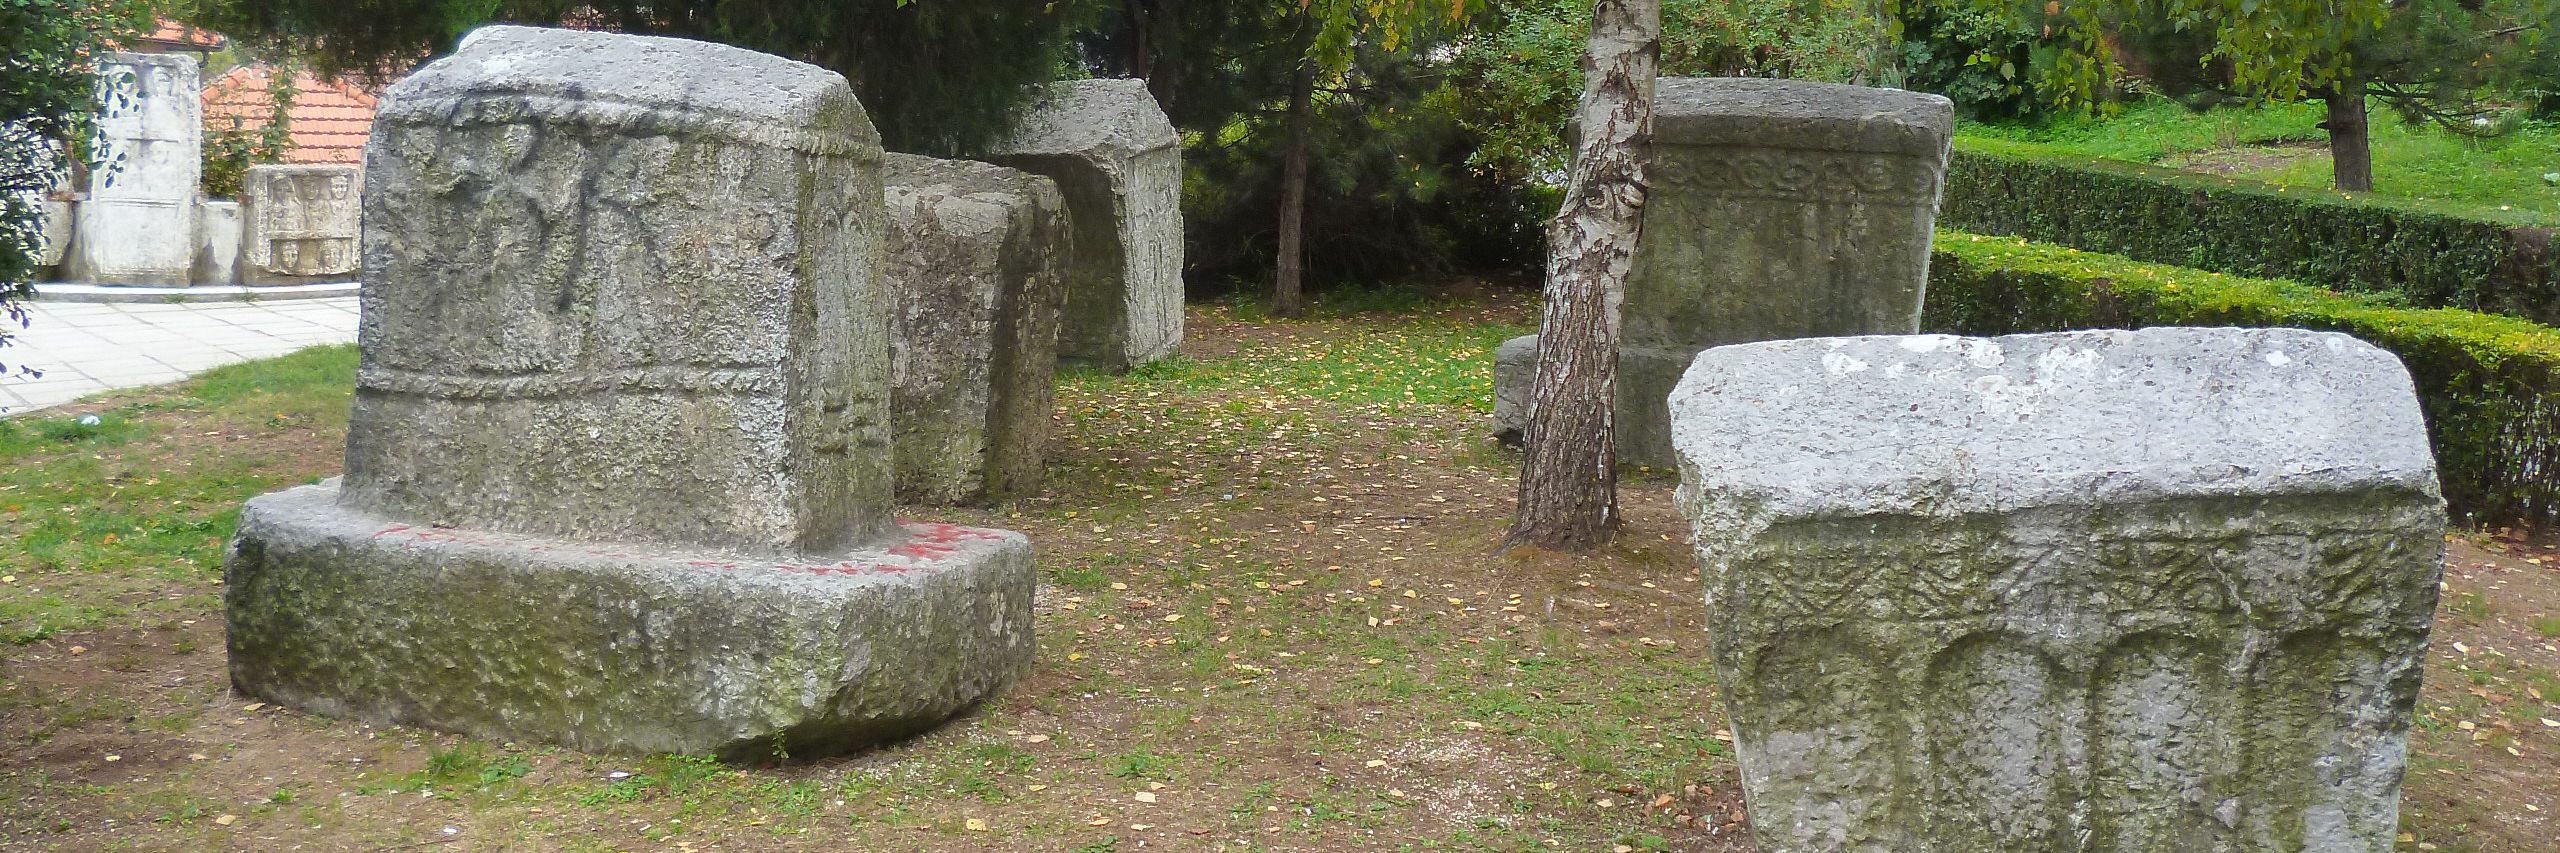 Стечки и римские стелы в Конице